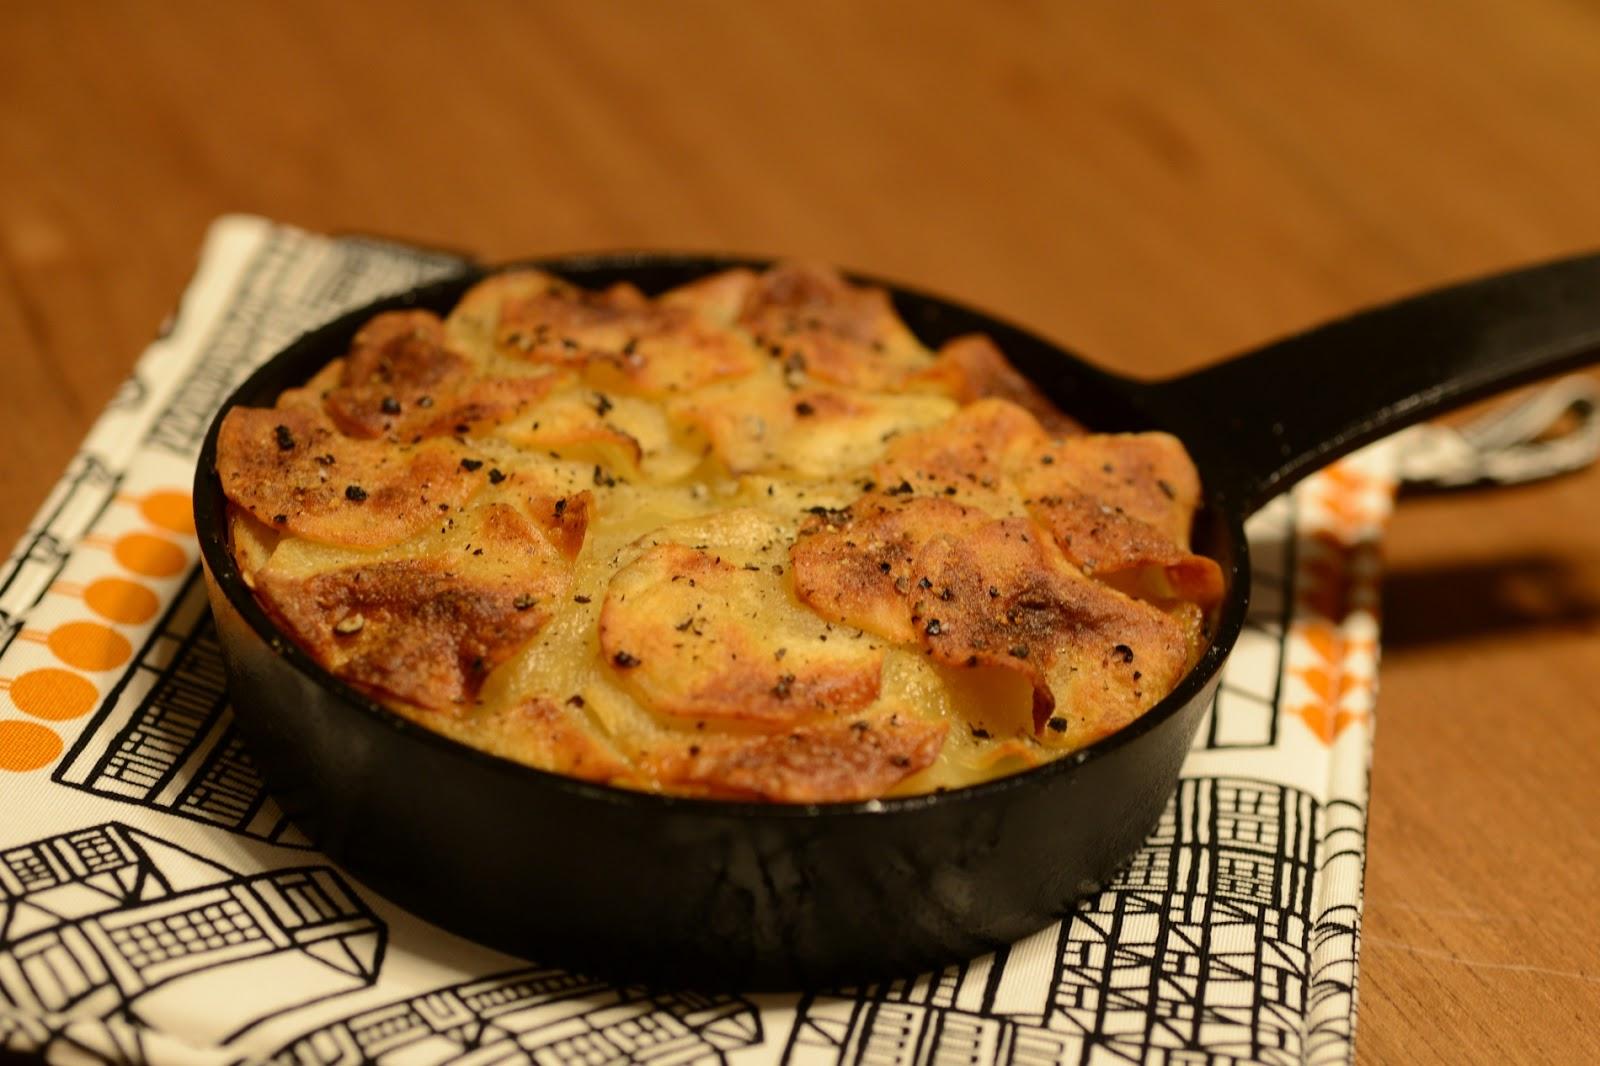 Cooking Experiment #1: Potato with a Fancy Name | Joie de